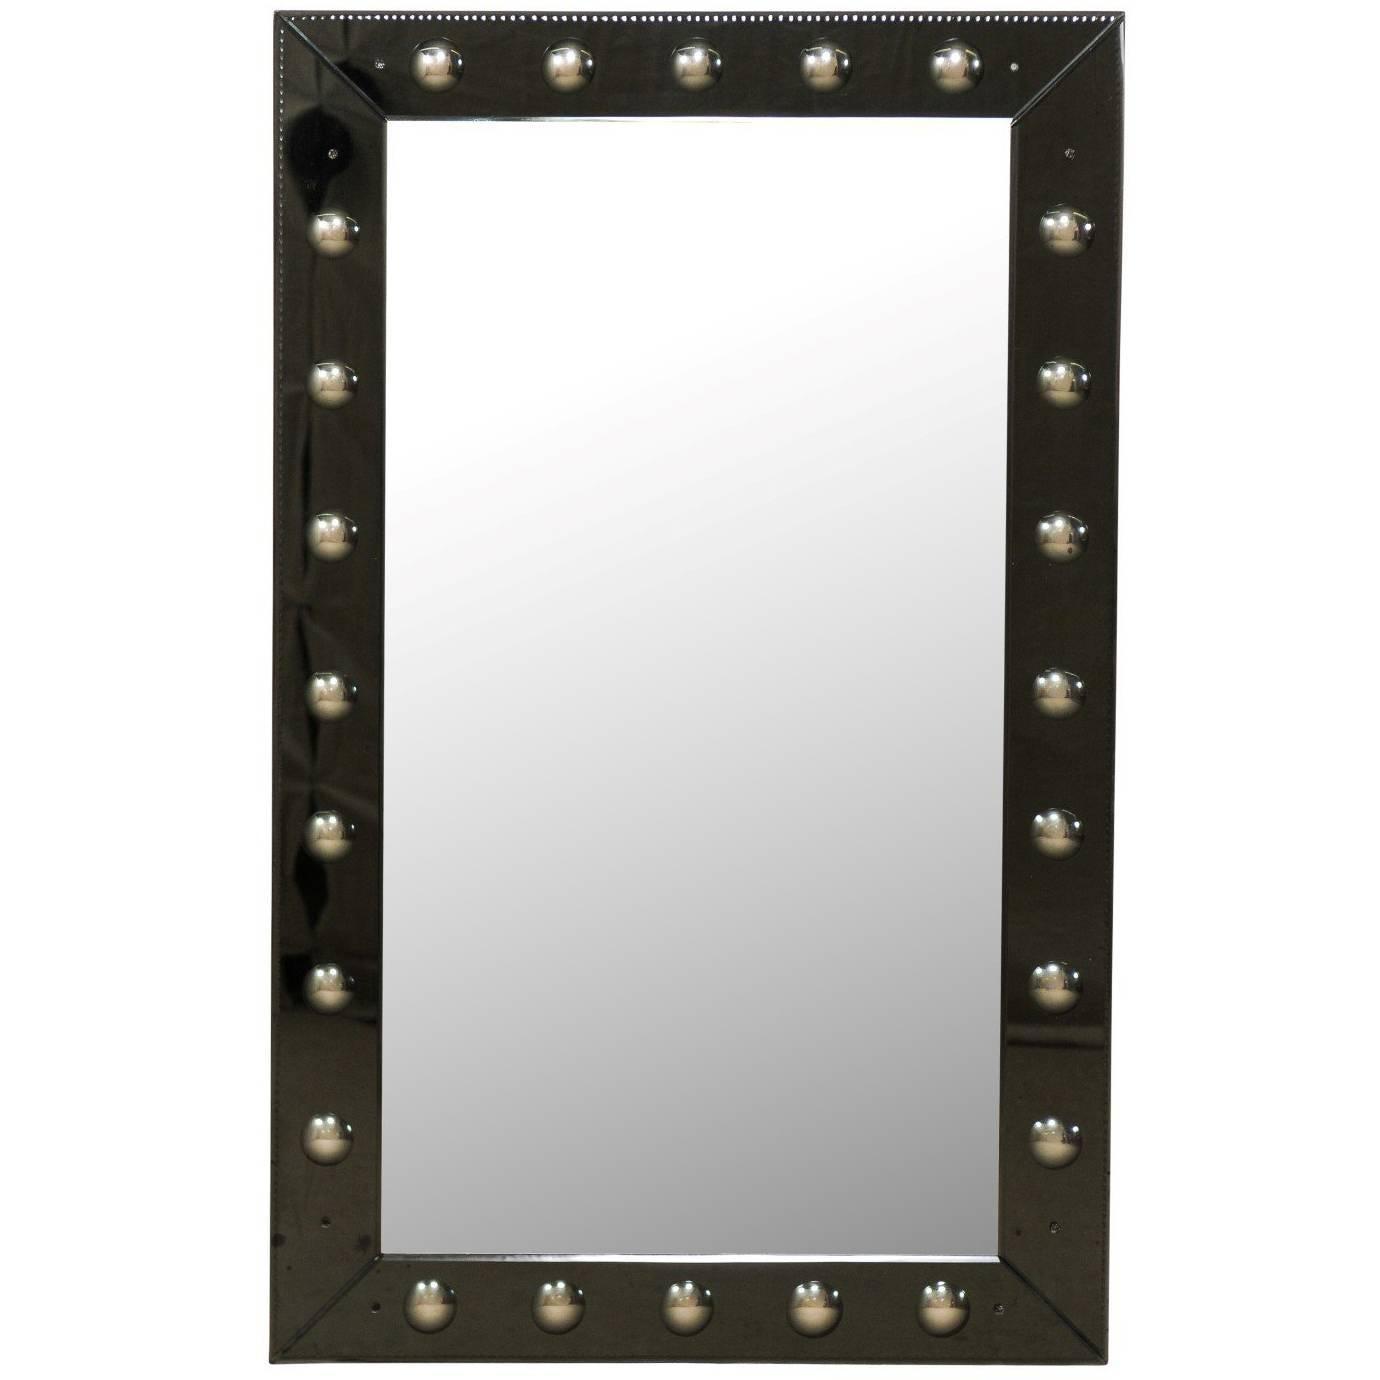 Elegant Vintage Black Rectangular Wall Mirror with Bullseye Pattern Border